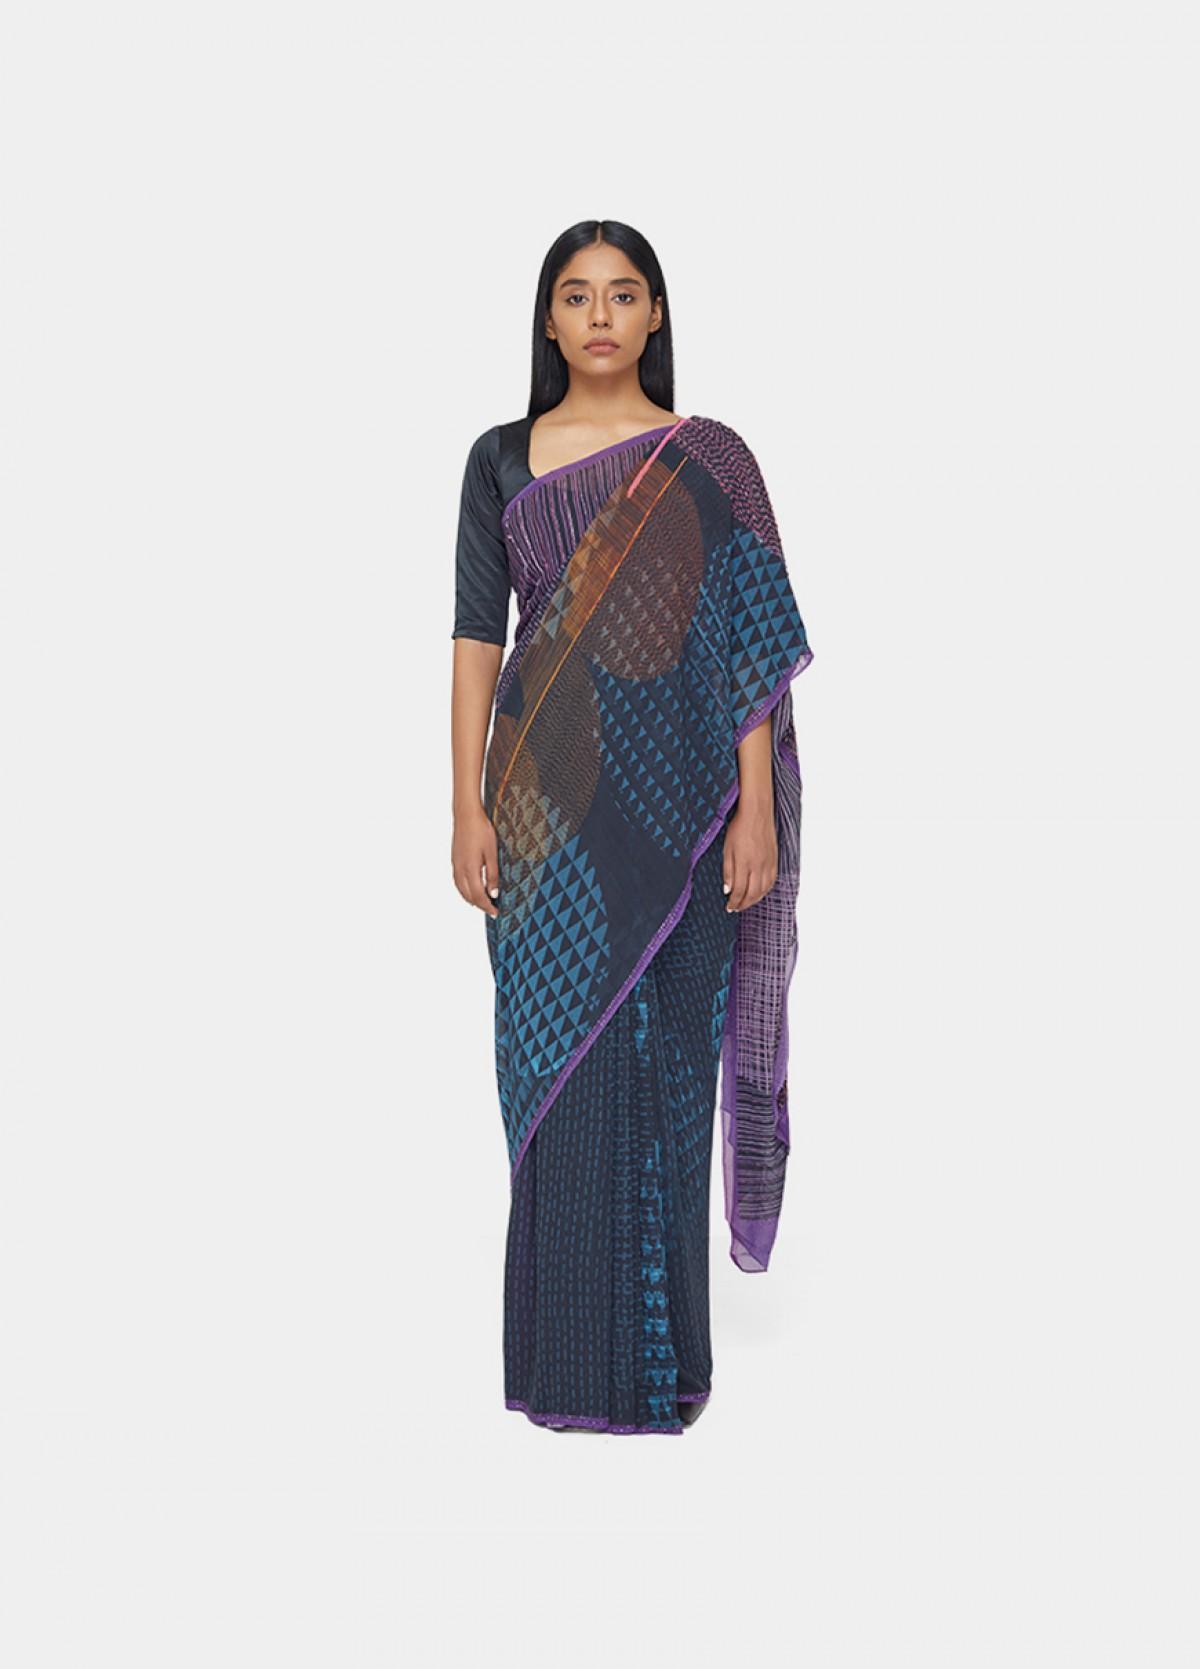 The Transition Sari